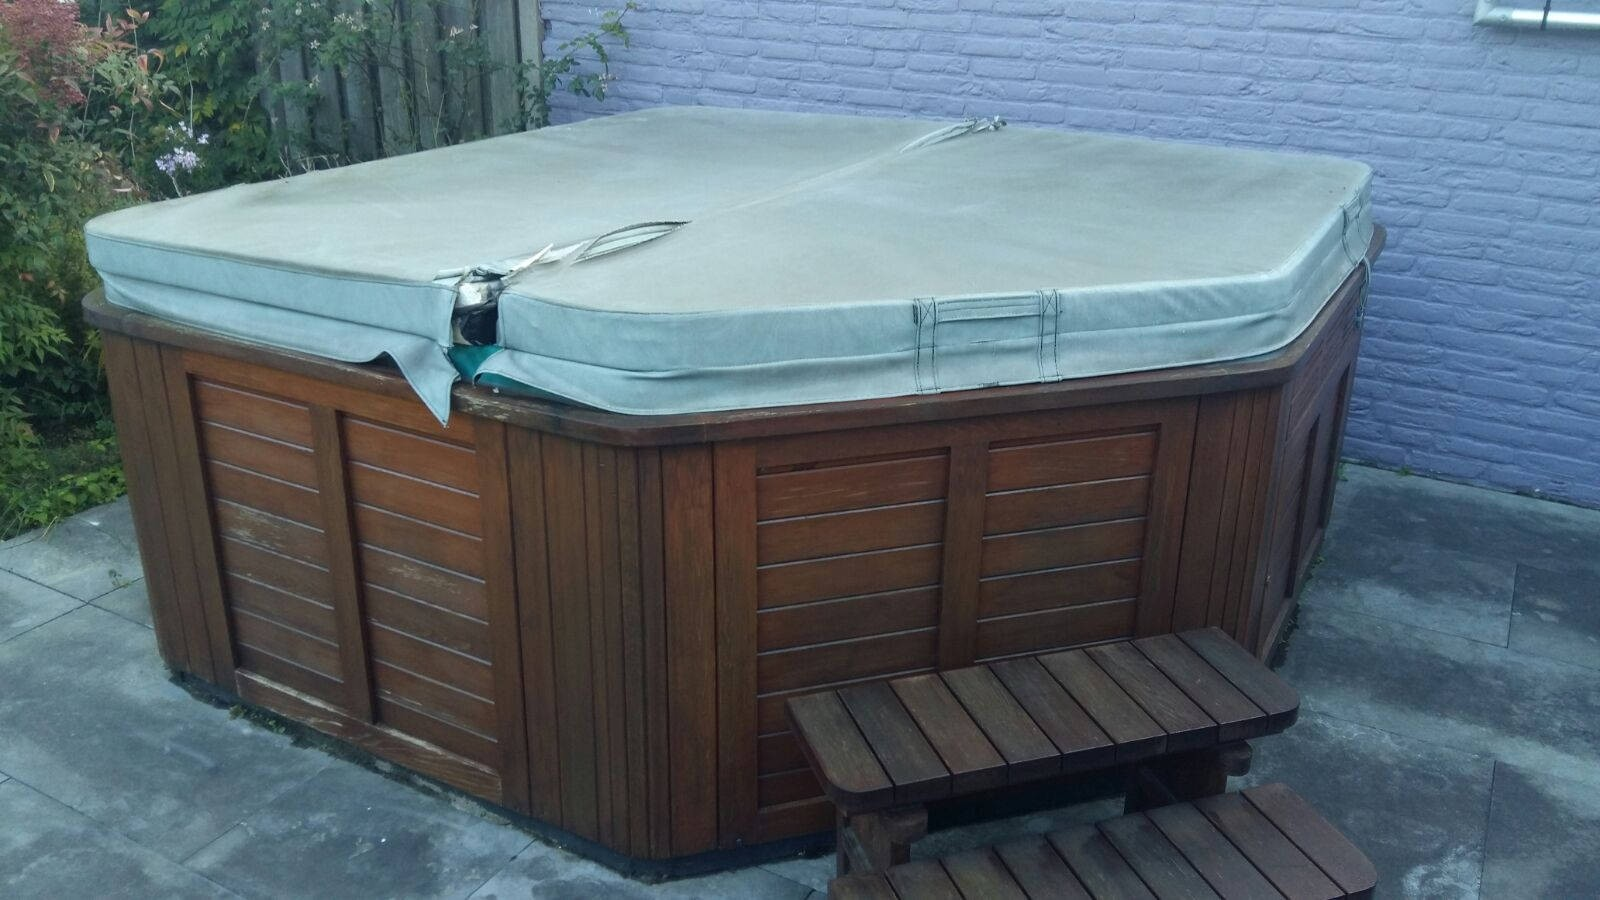 Reparatie lekkage en vervanging spa cover van een Hydropool spa in Nederweert